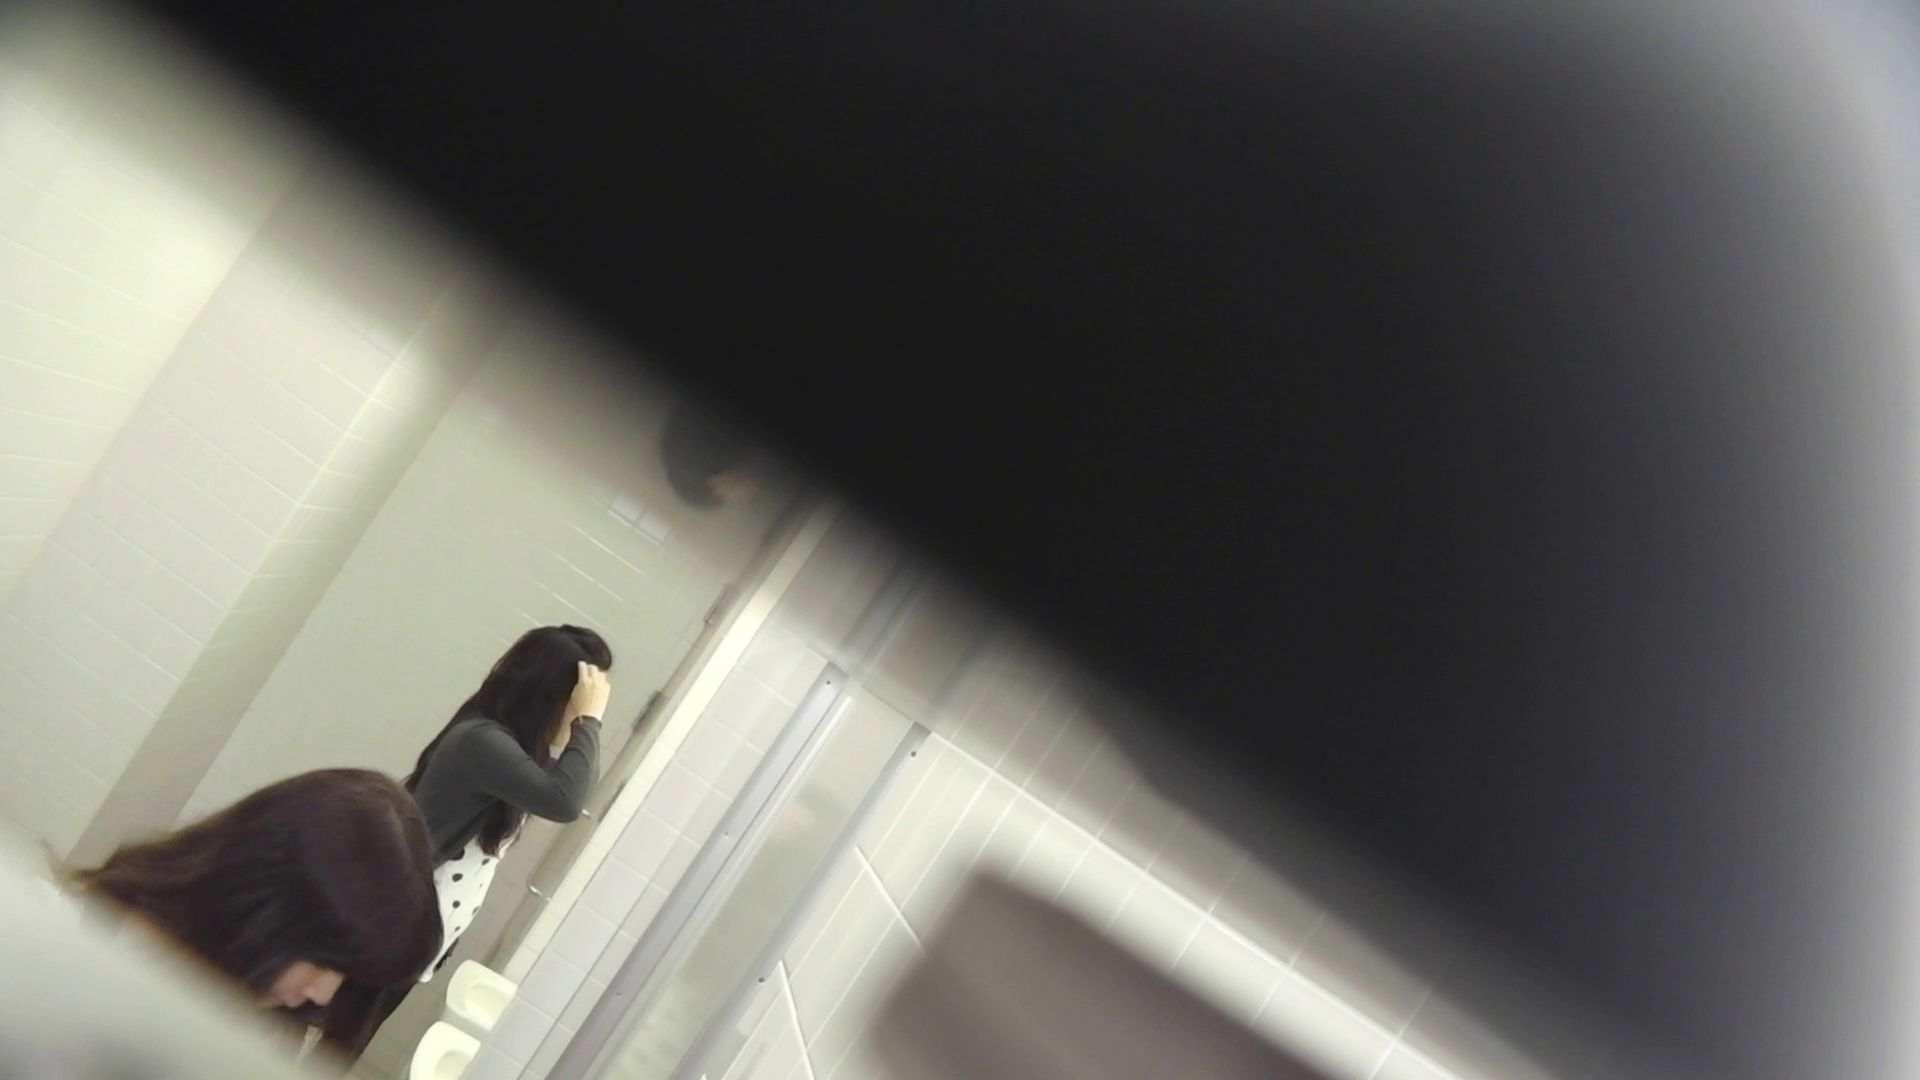 vol.10 命がけ潜伏洗面所! バックからヒクヒク。 潜入 盗み撮り動画 96画像 67